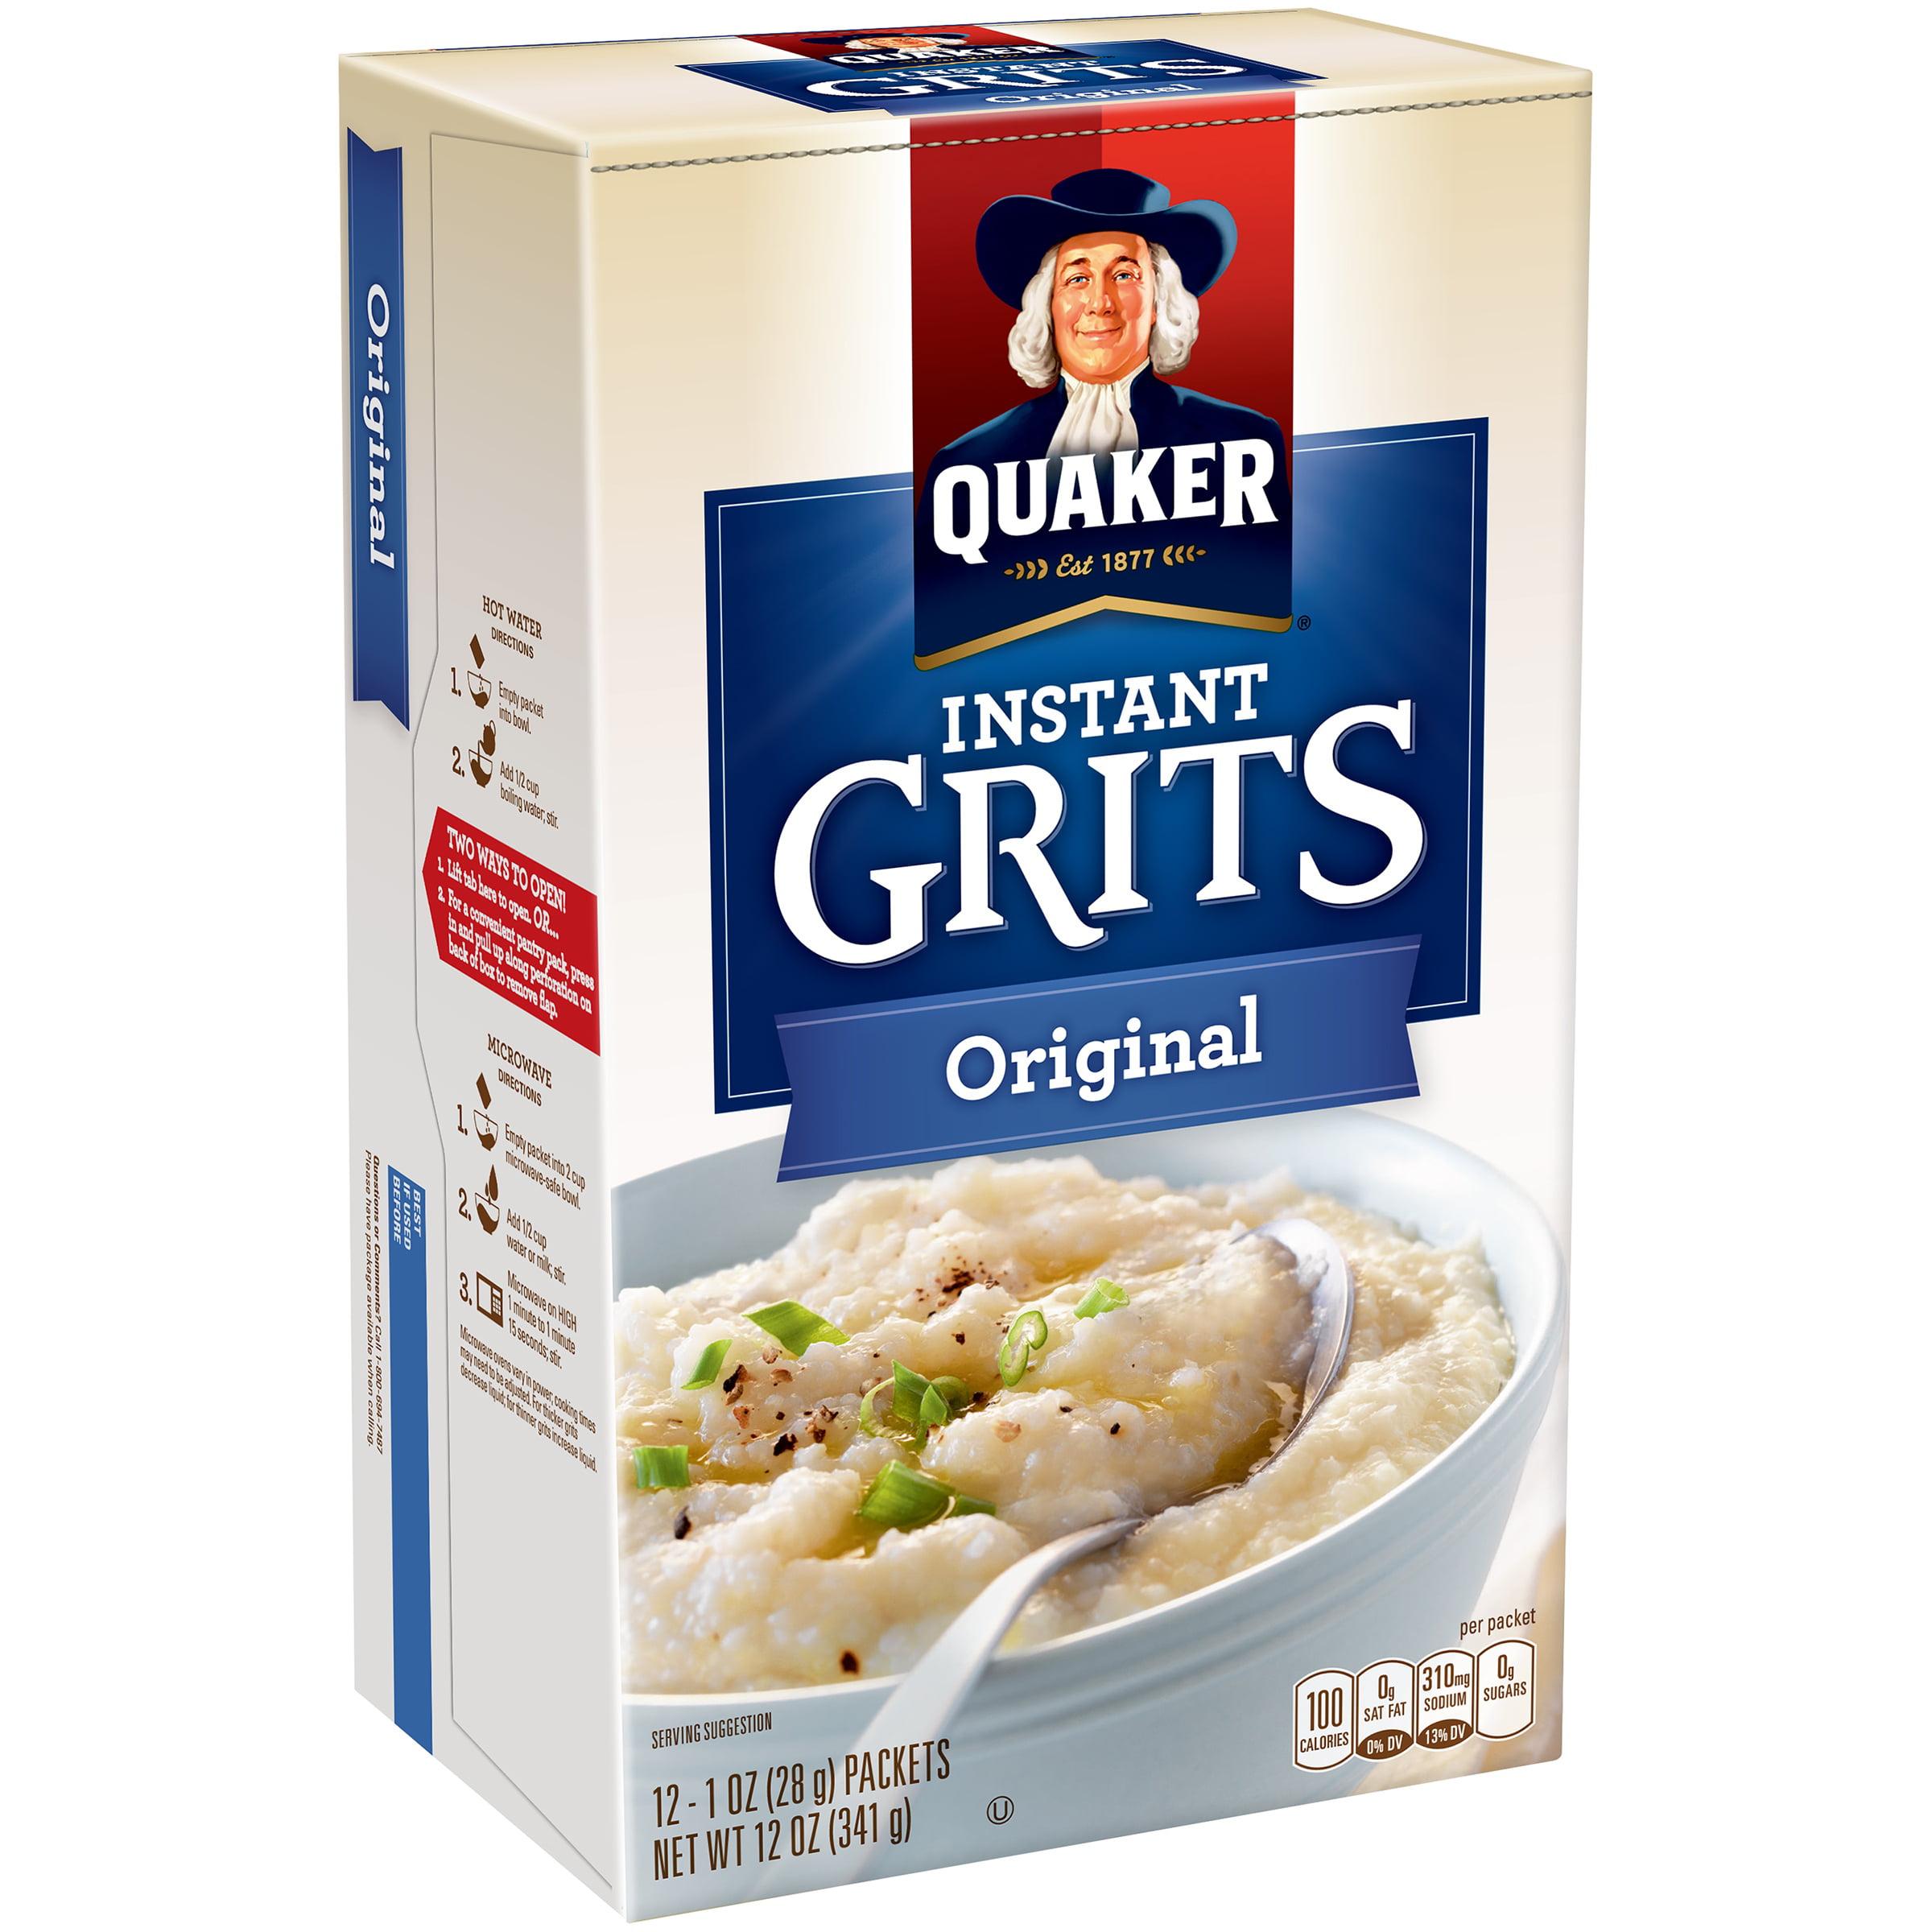 Quaker Instant Grits, Original, 1 oz Packets, 12 Count